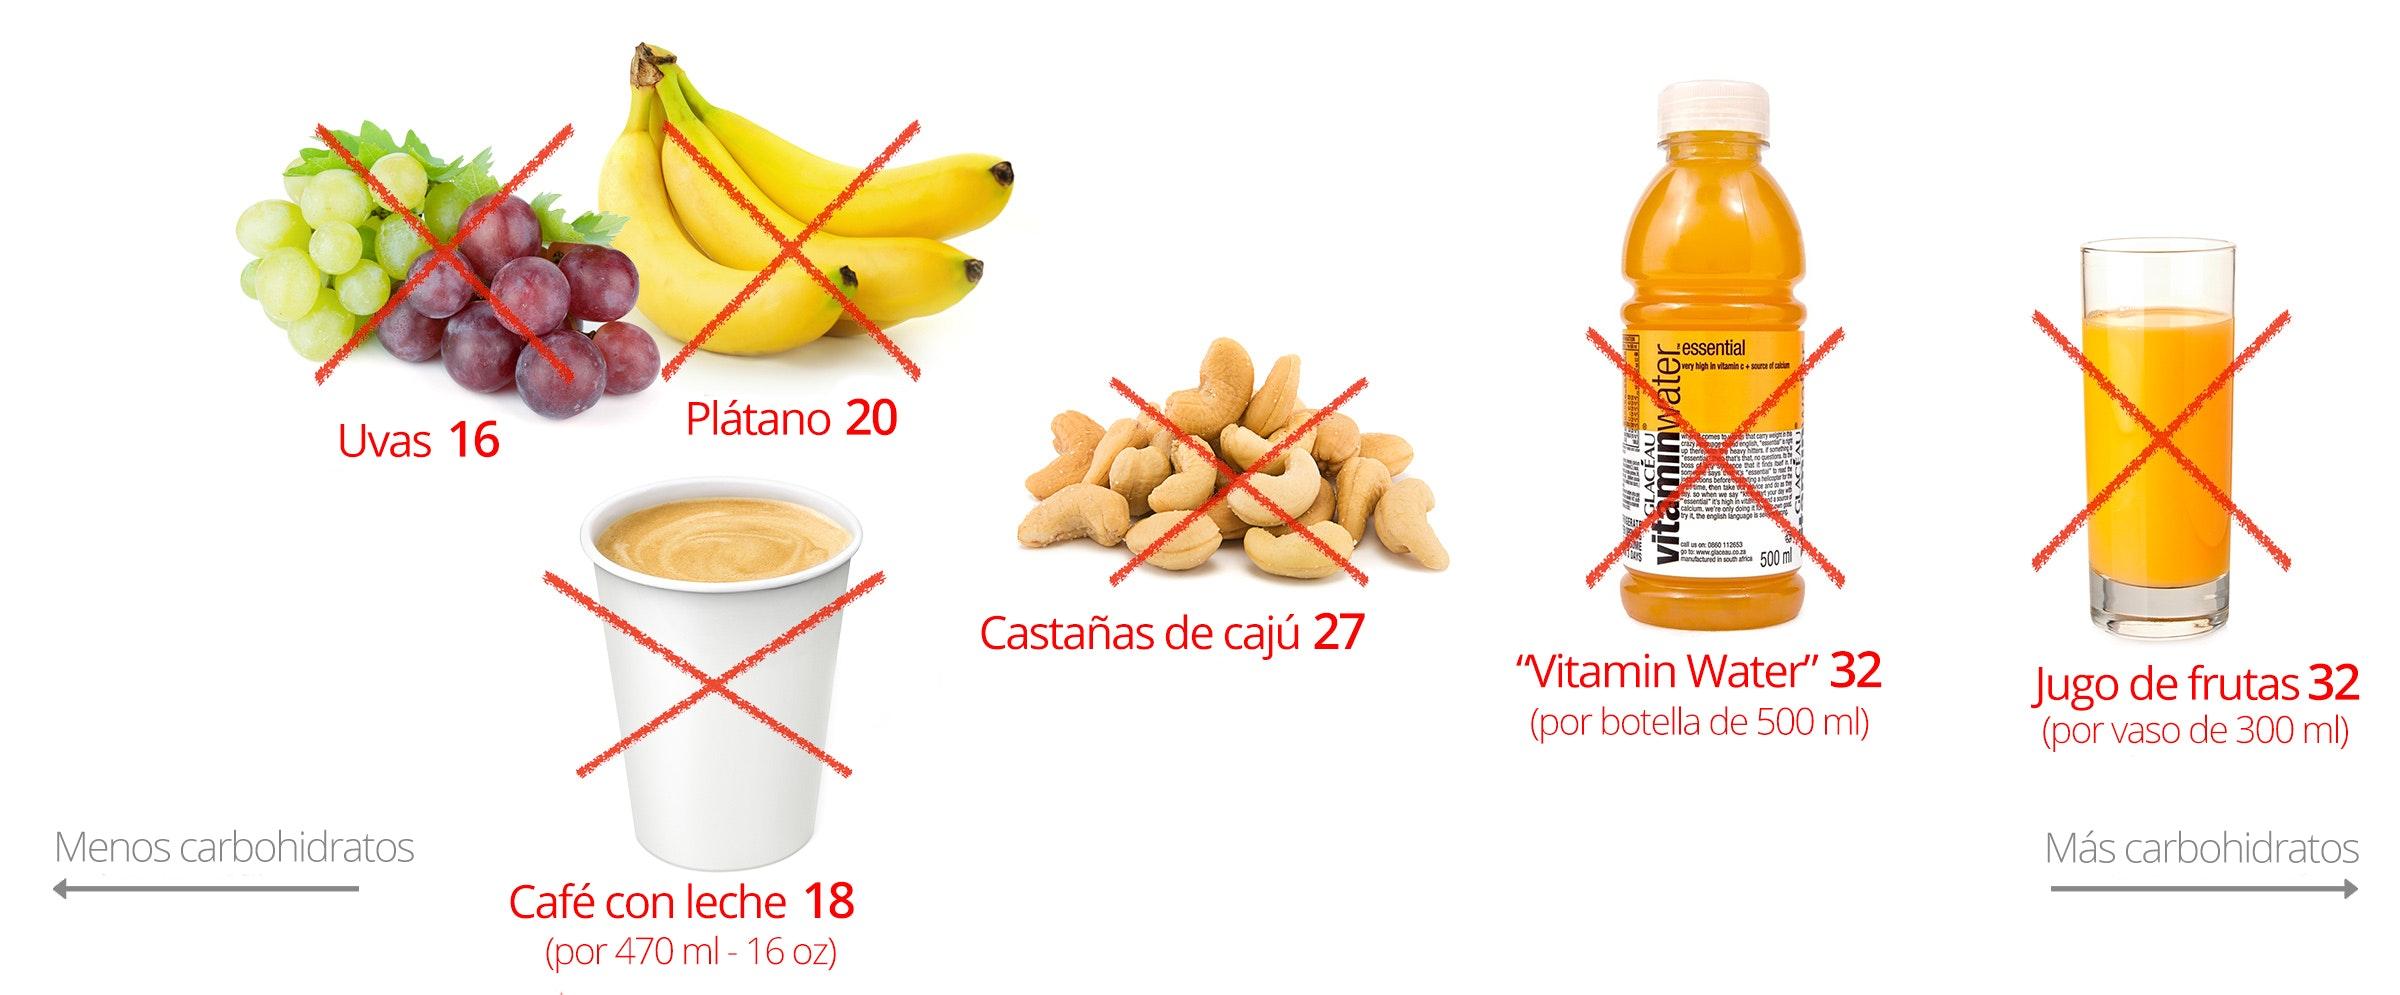 Crema batida dieta cetogenica